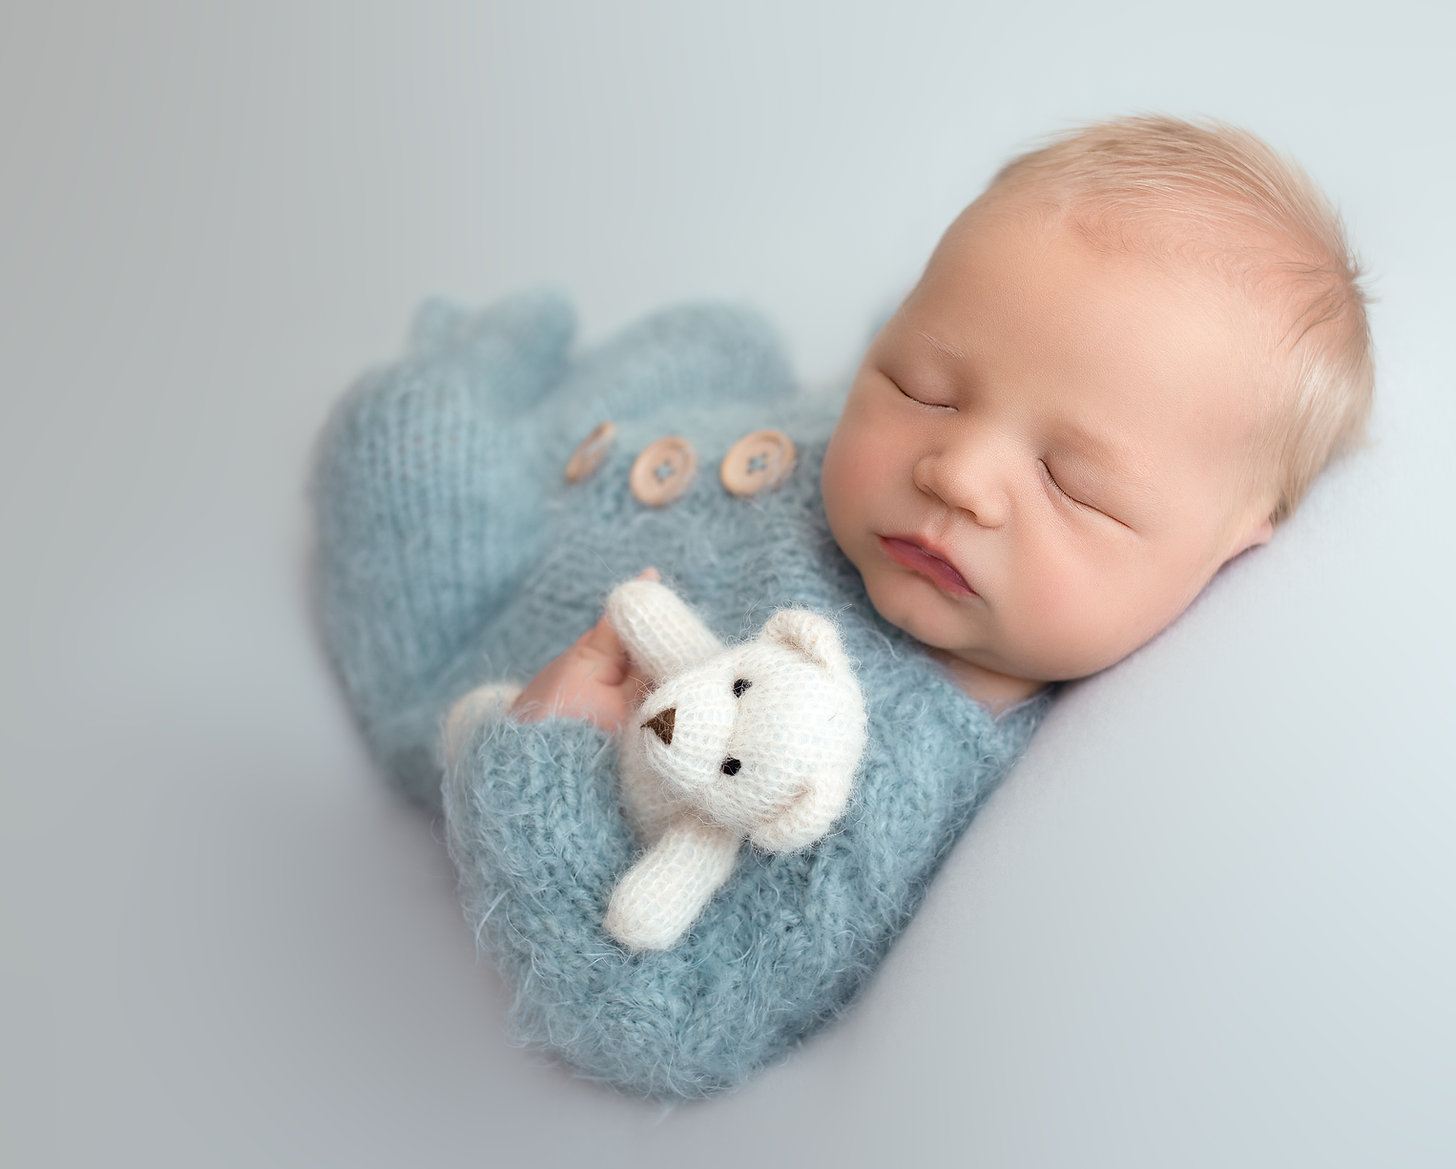 newborn BABY photographer in the woodlands